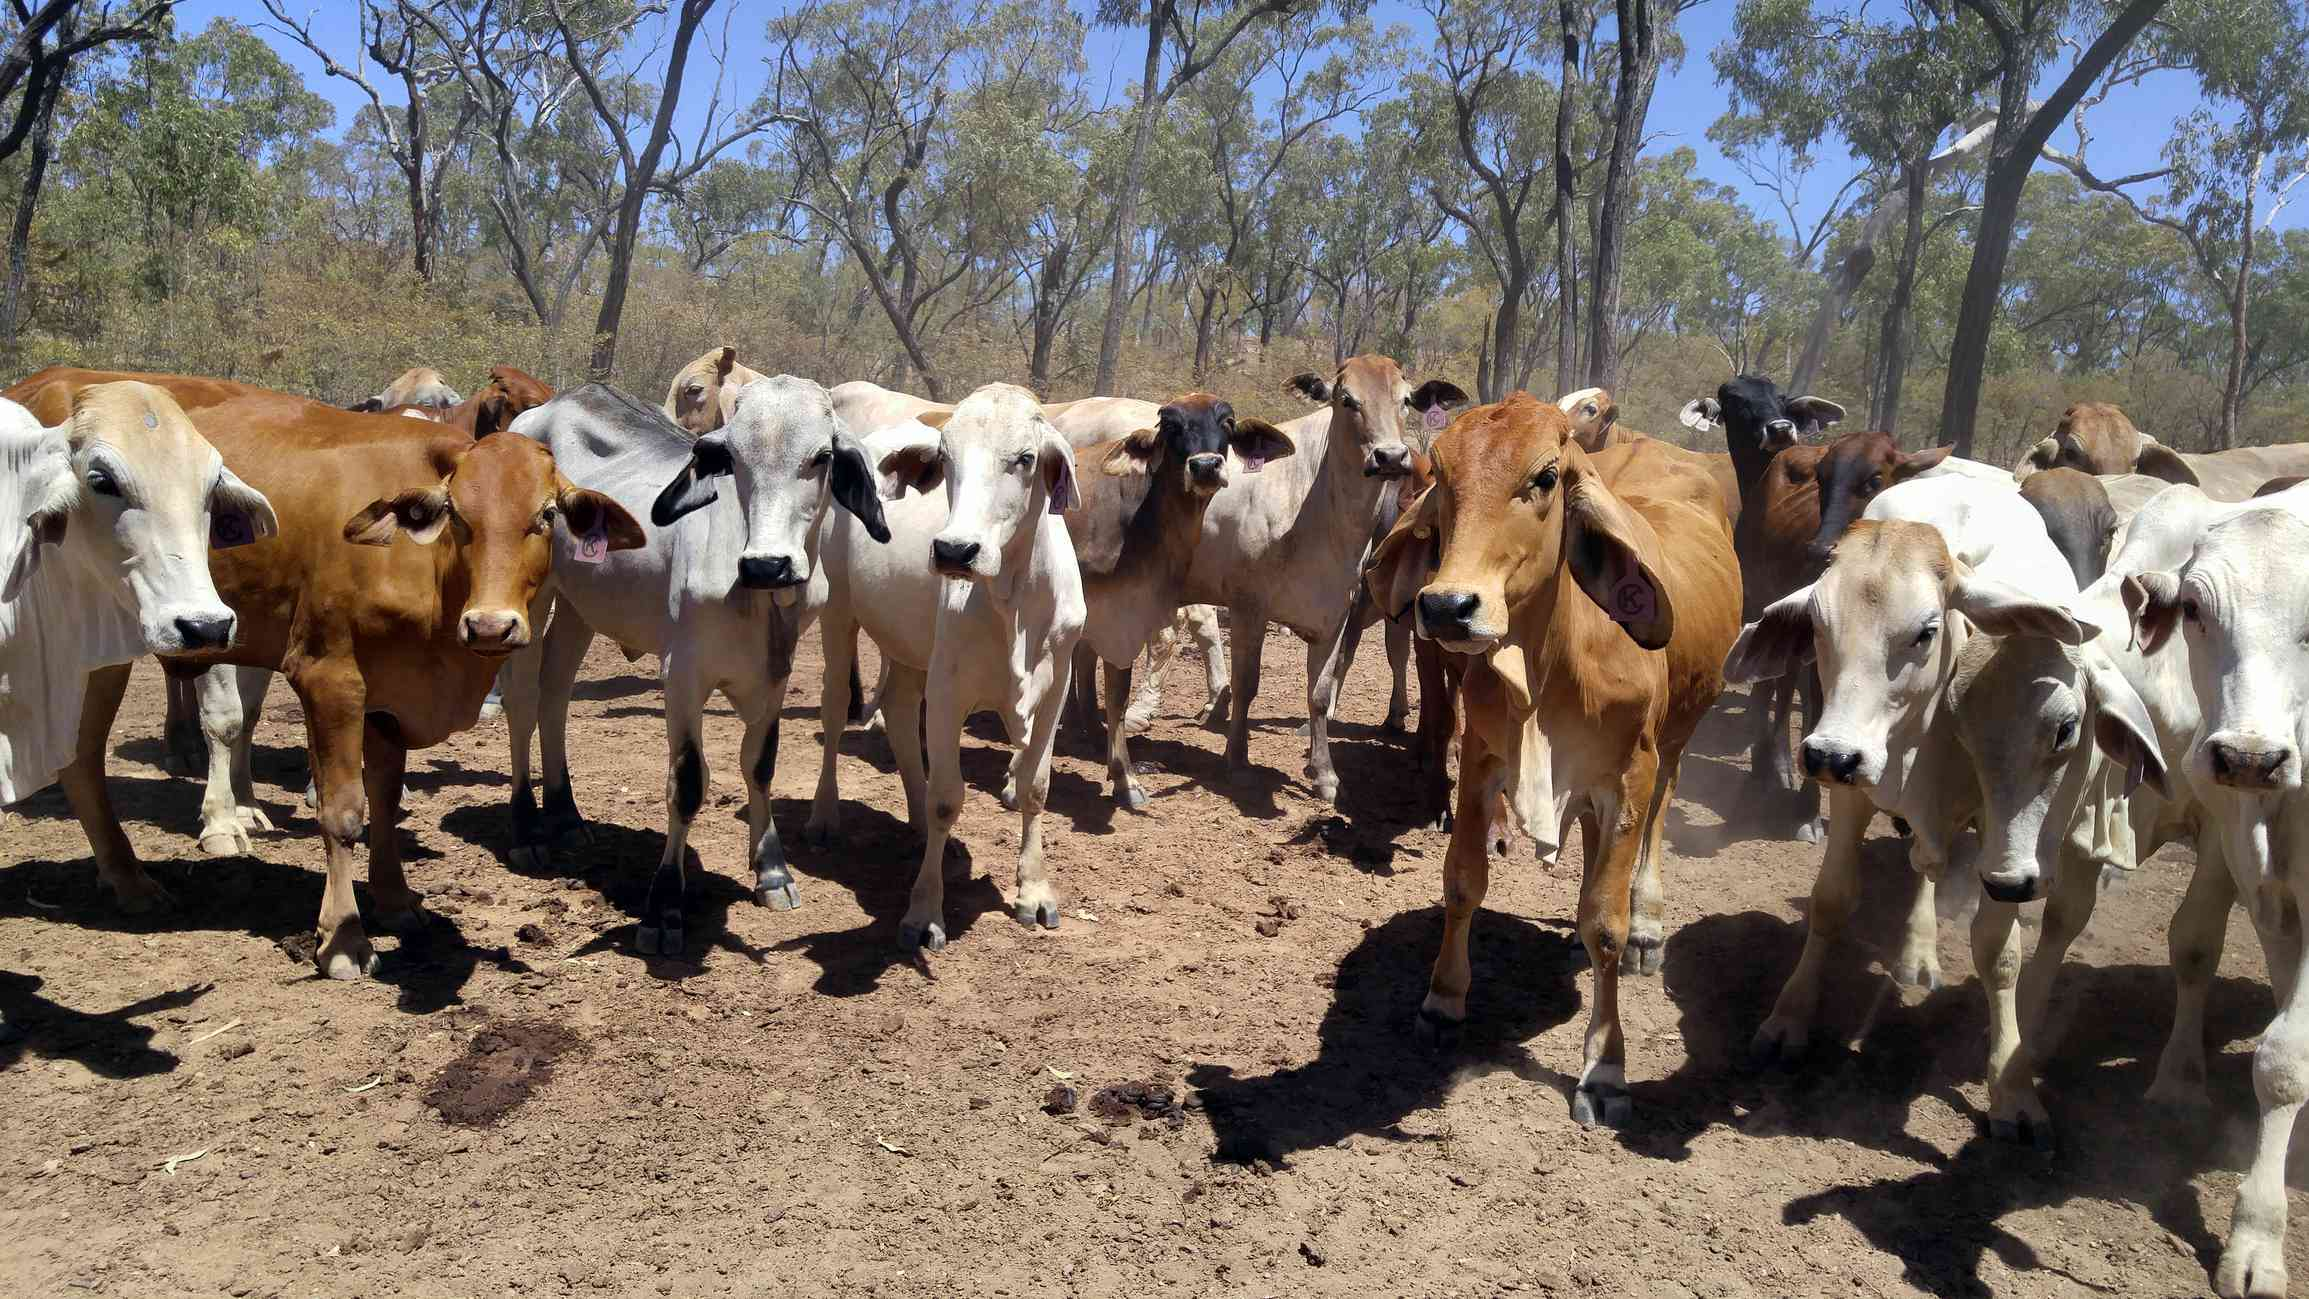 Beef Cattle in overgrazed area